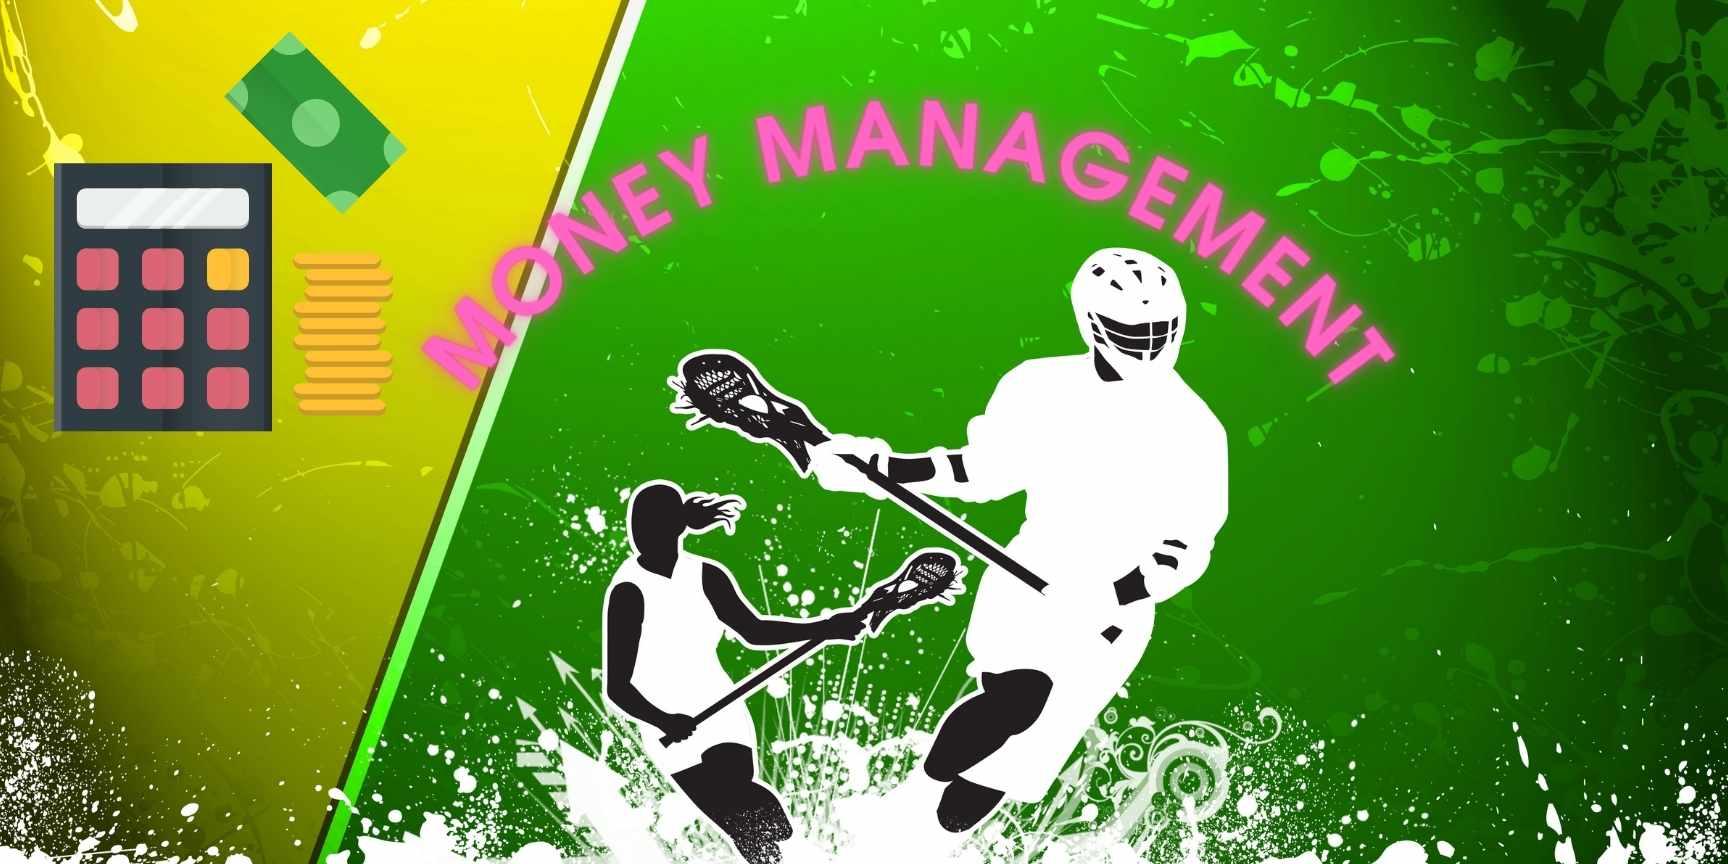 money management in lacrosse